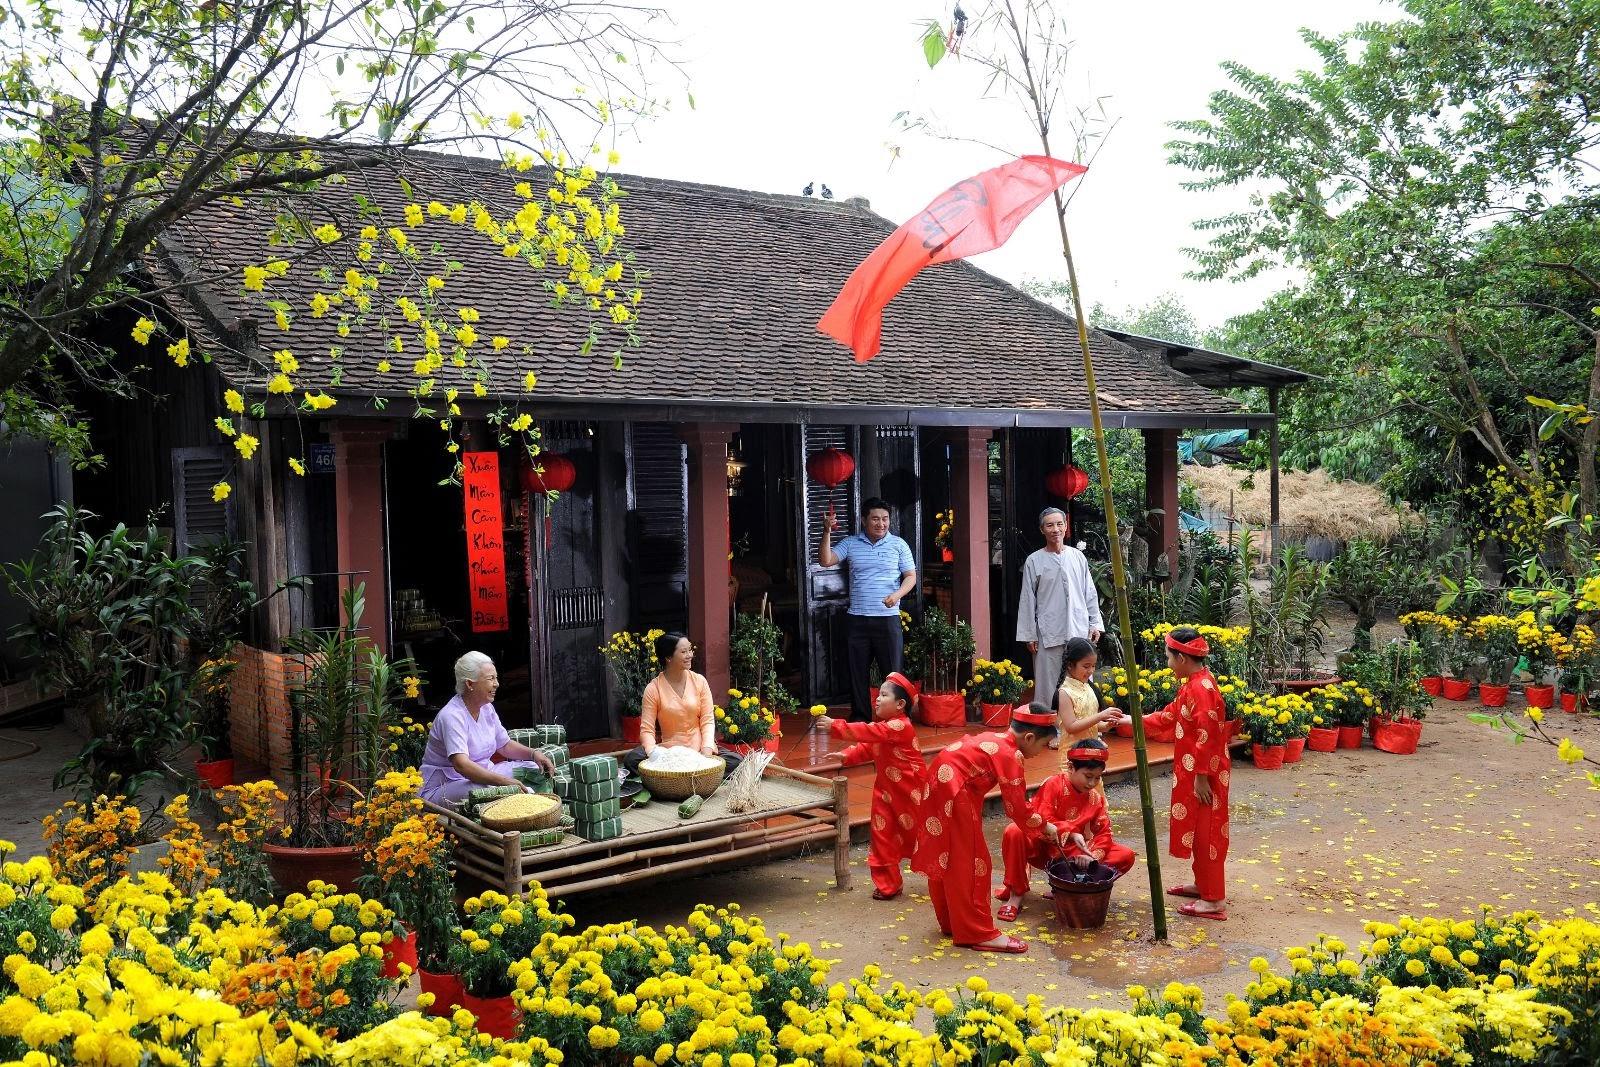 lunar new year in vietnam tet holiday vietnam visa services landing visa in vietnam. Black Bedroom Furniture Sets. Home Design Ideas